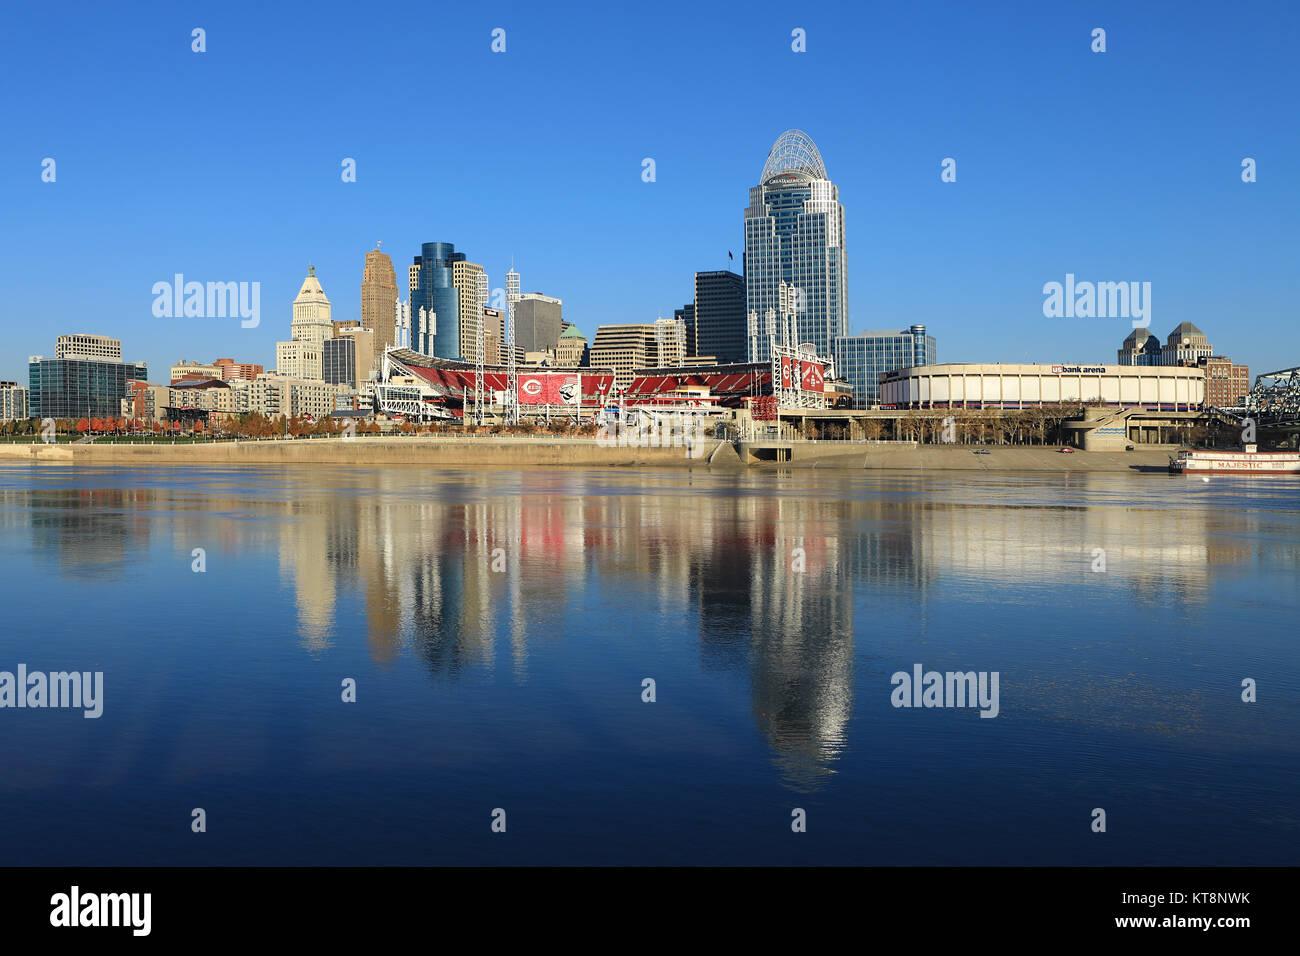 The Great American Ballpark in Cincinnati across the Ohio River - Stock Image